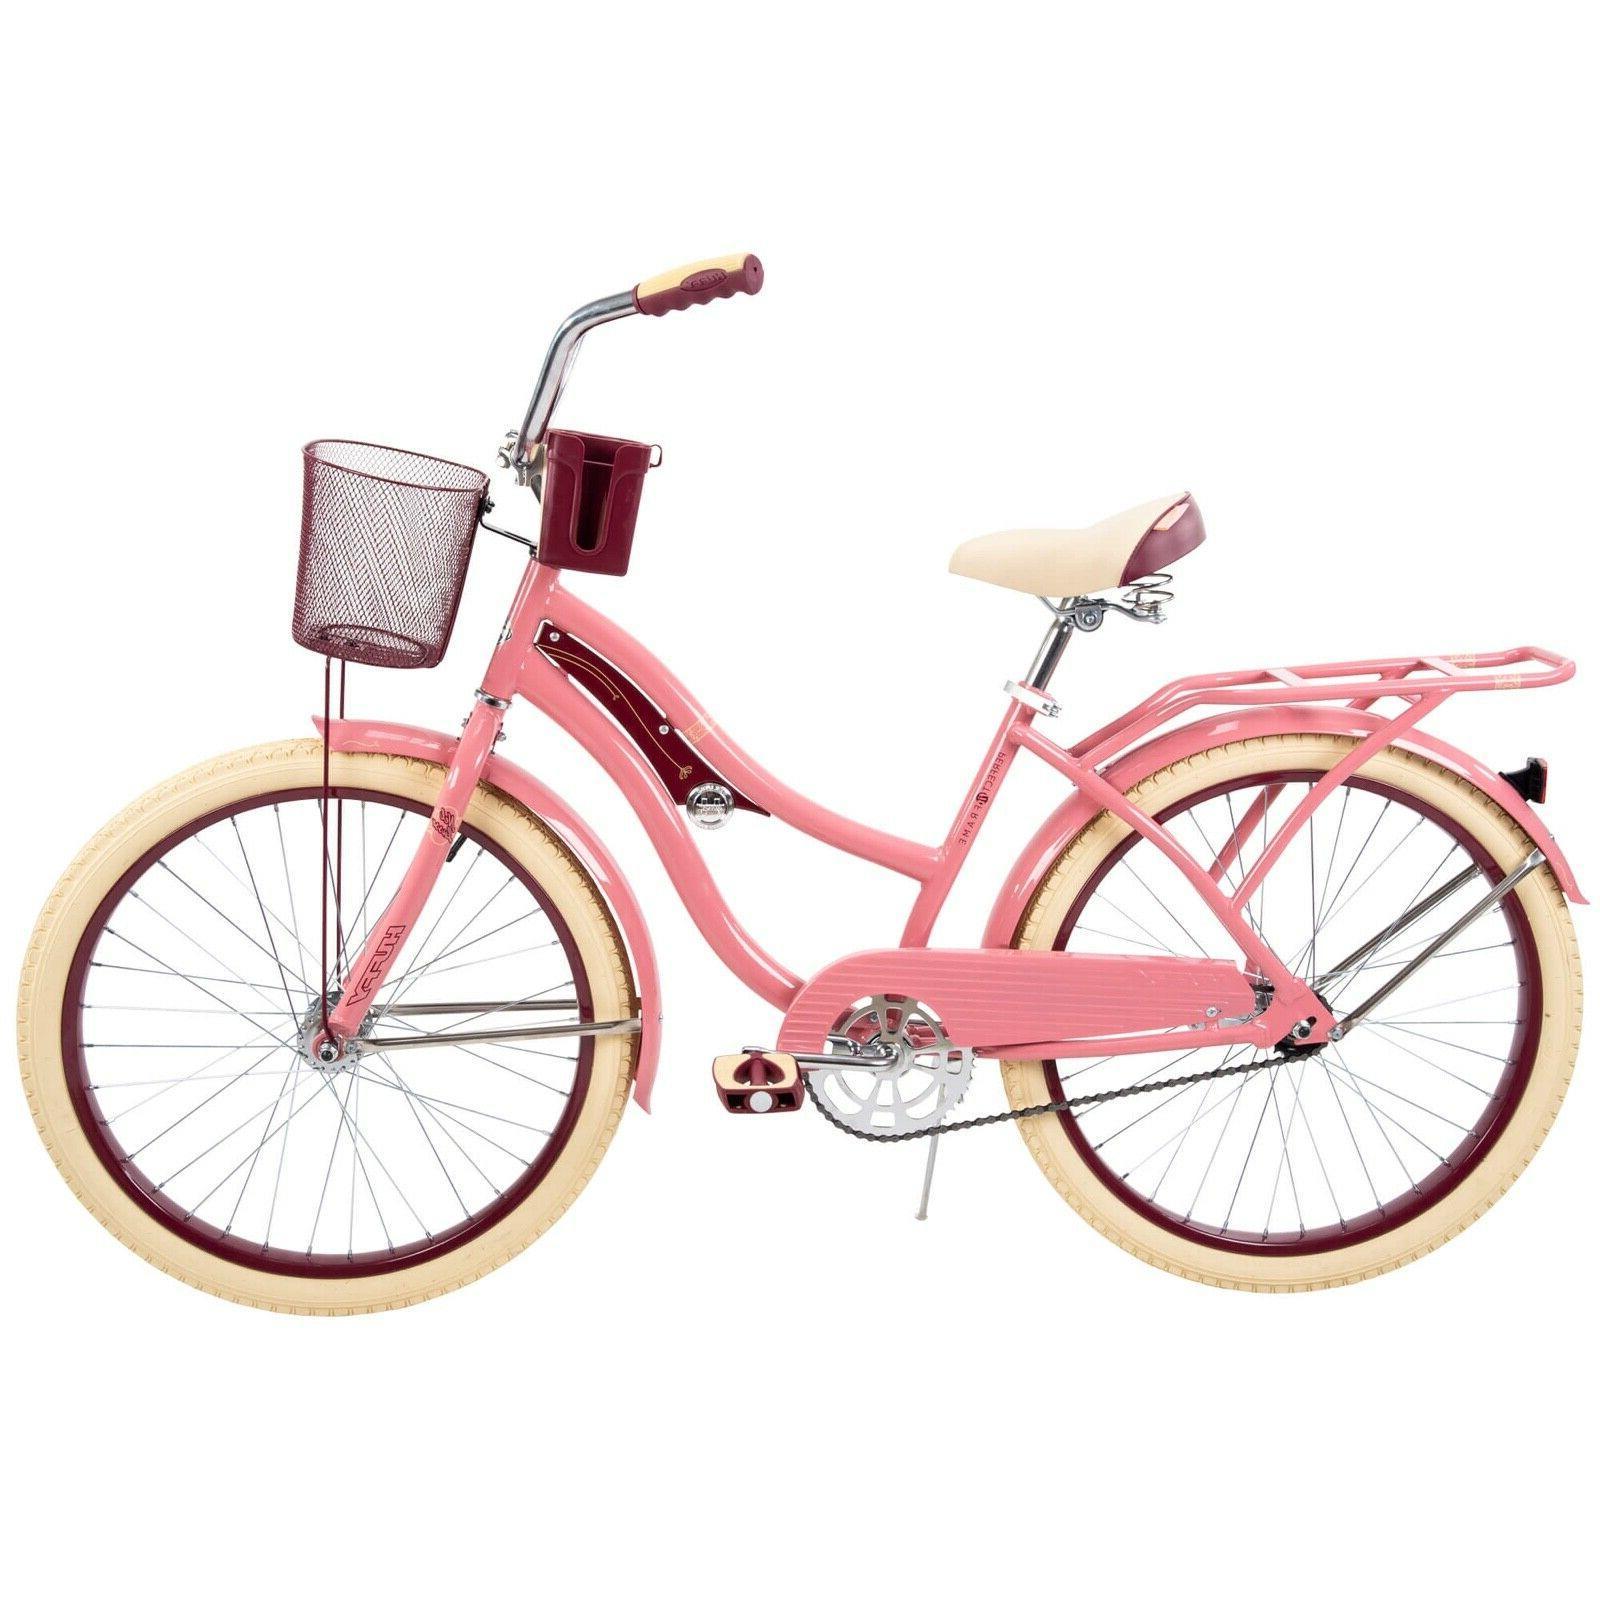 🚲Huffy Cruiser Bike BEST - SHIP FAST